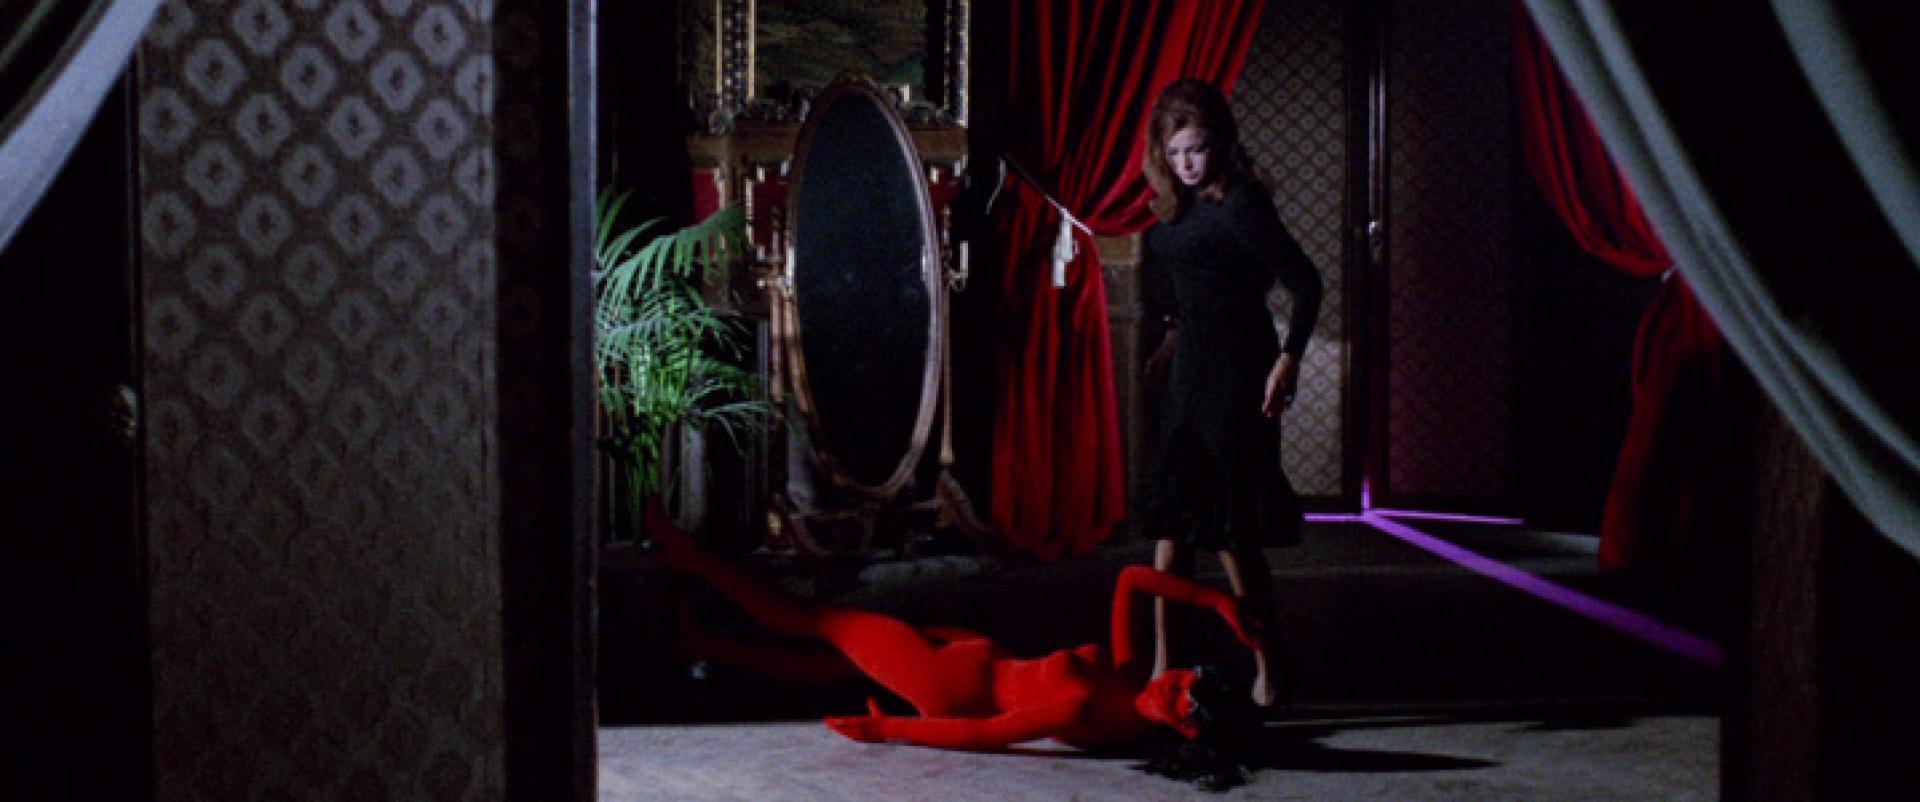 Sei donne per l'assassino - Hat nő és a gyilkos / Hat halott modell (1964)